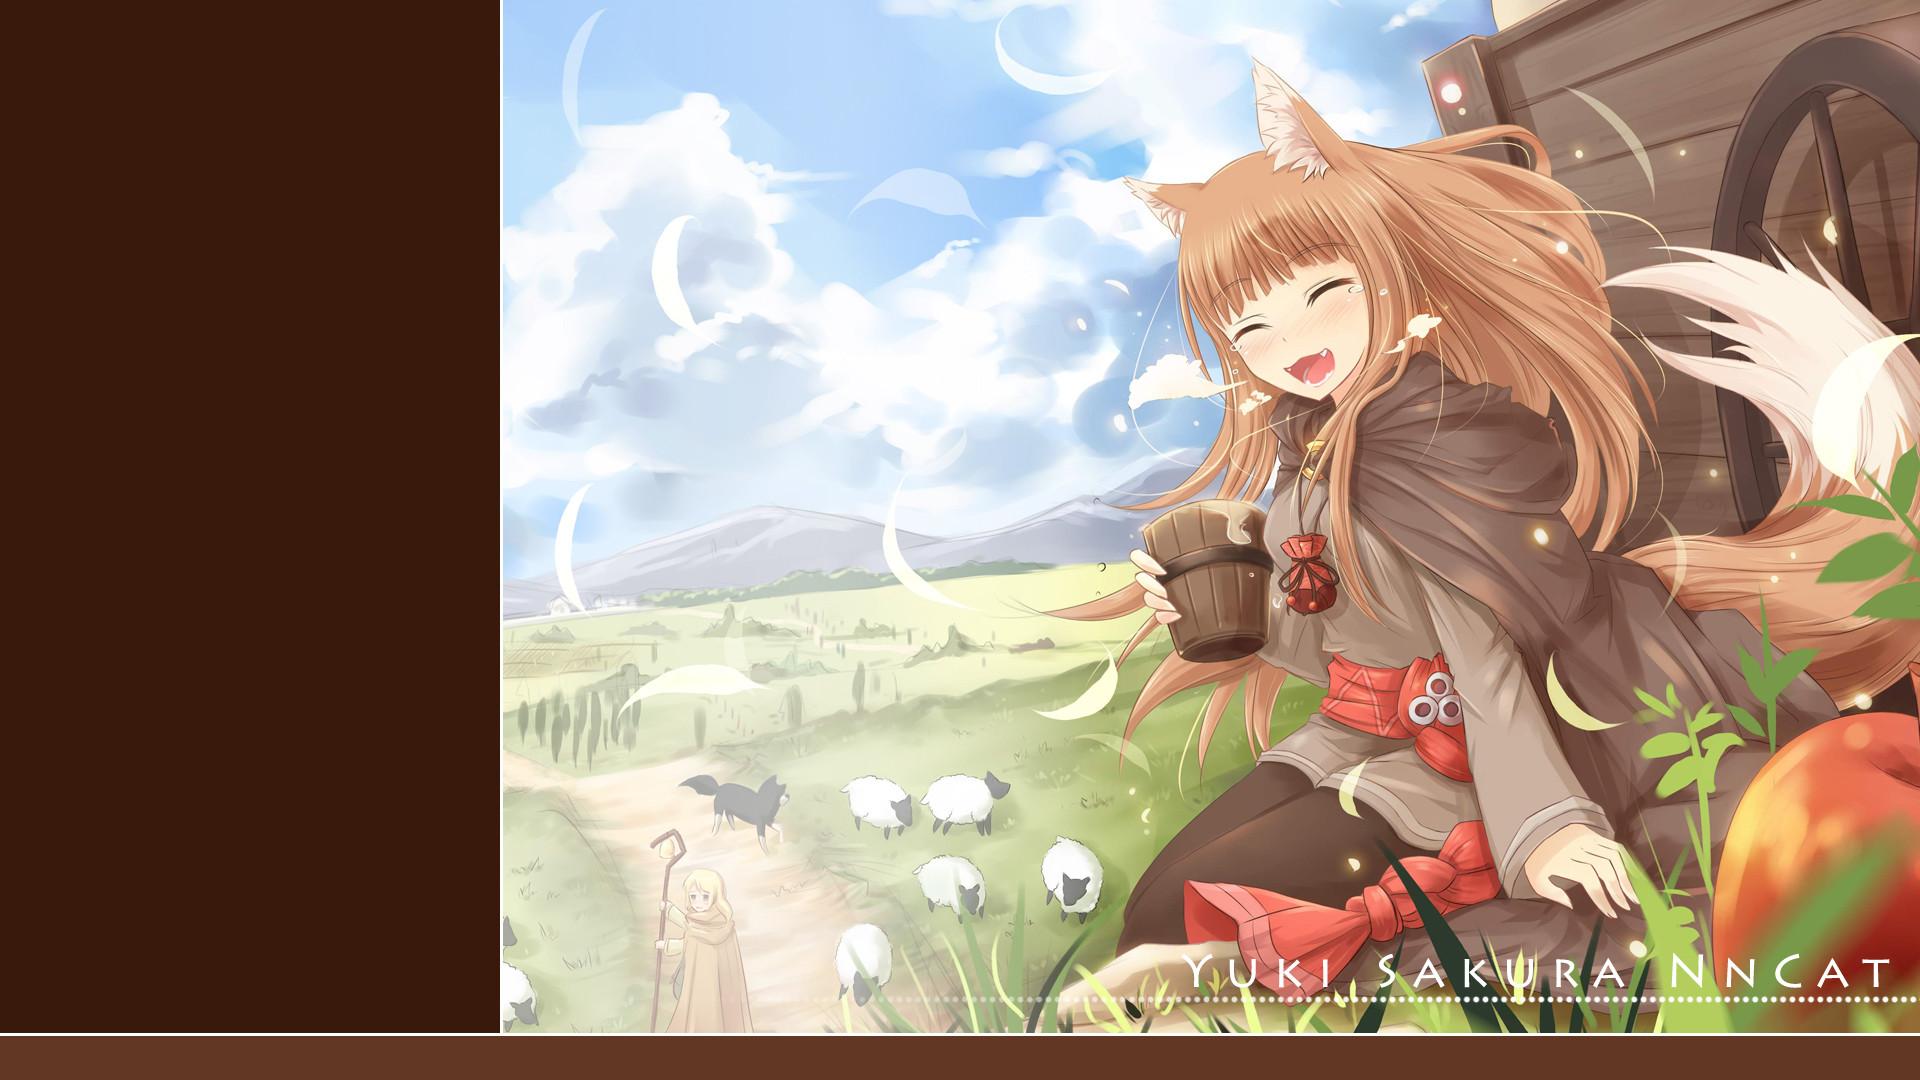 Tags: Anime, Nncat, Ookami to Koushinryou, Horo, Nora Arendt, Wallpaper